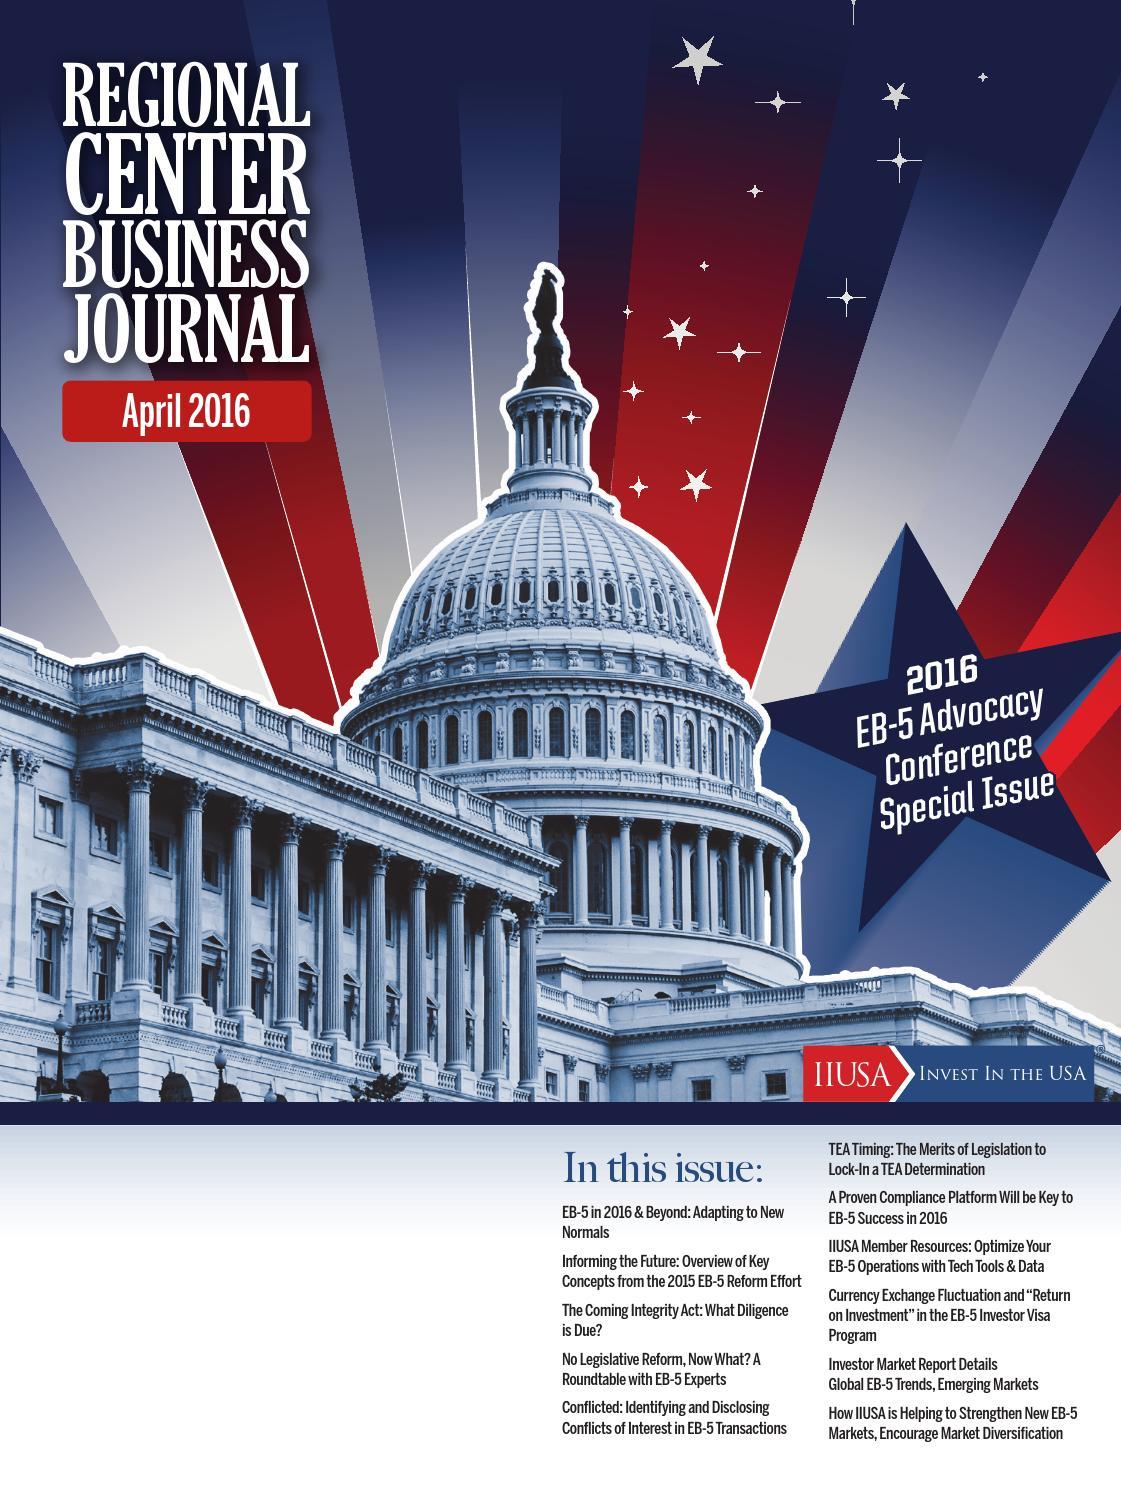 Regional Center Business Journal (04/2016) by IIUSA - issuu